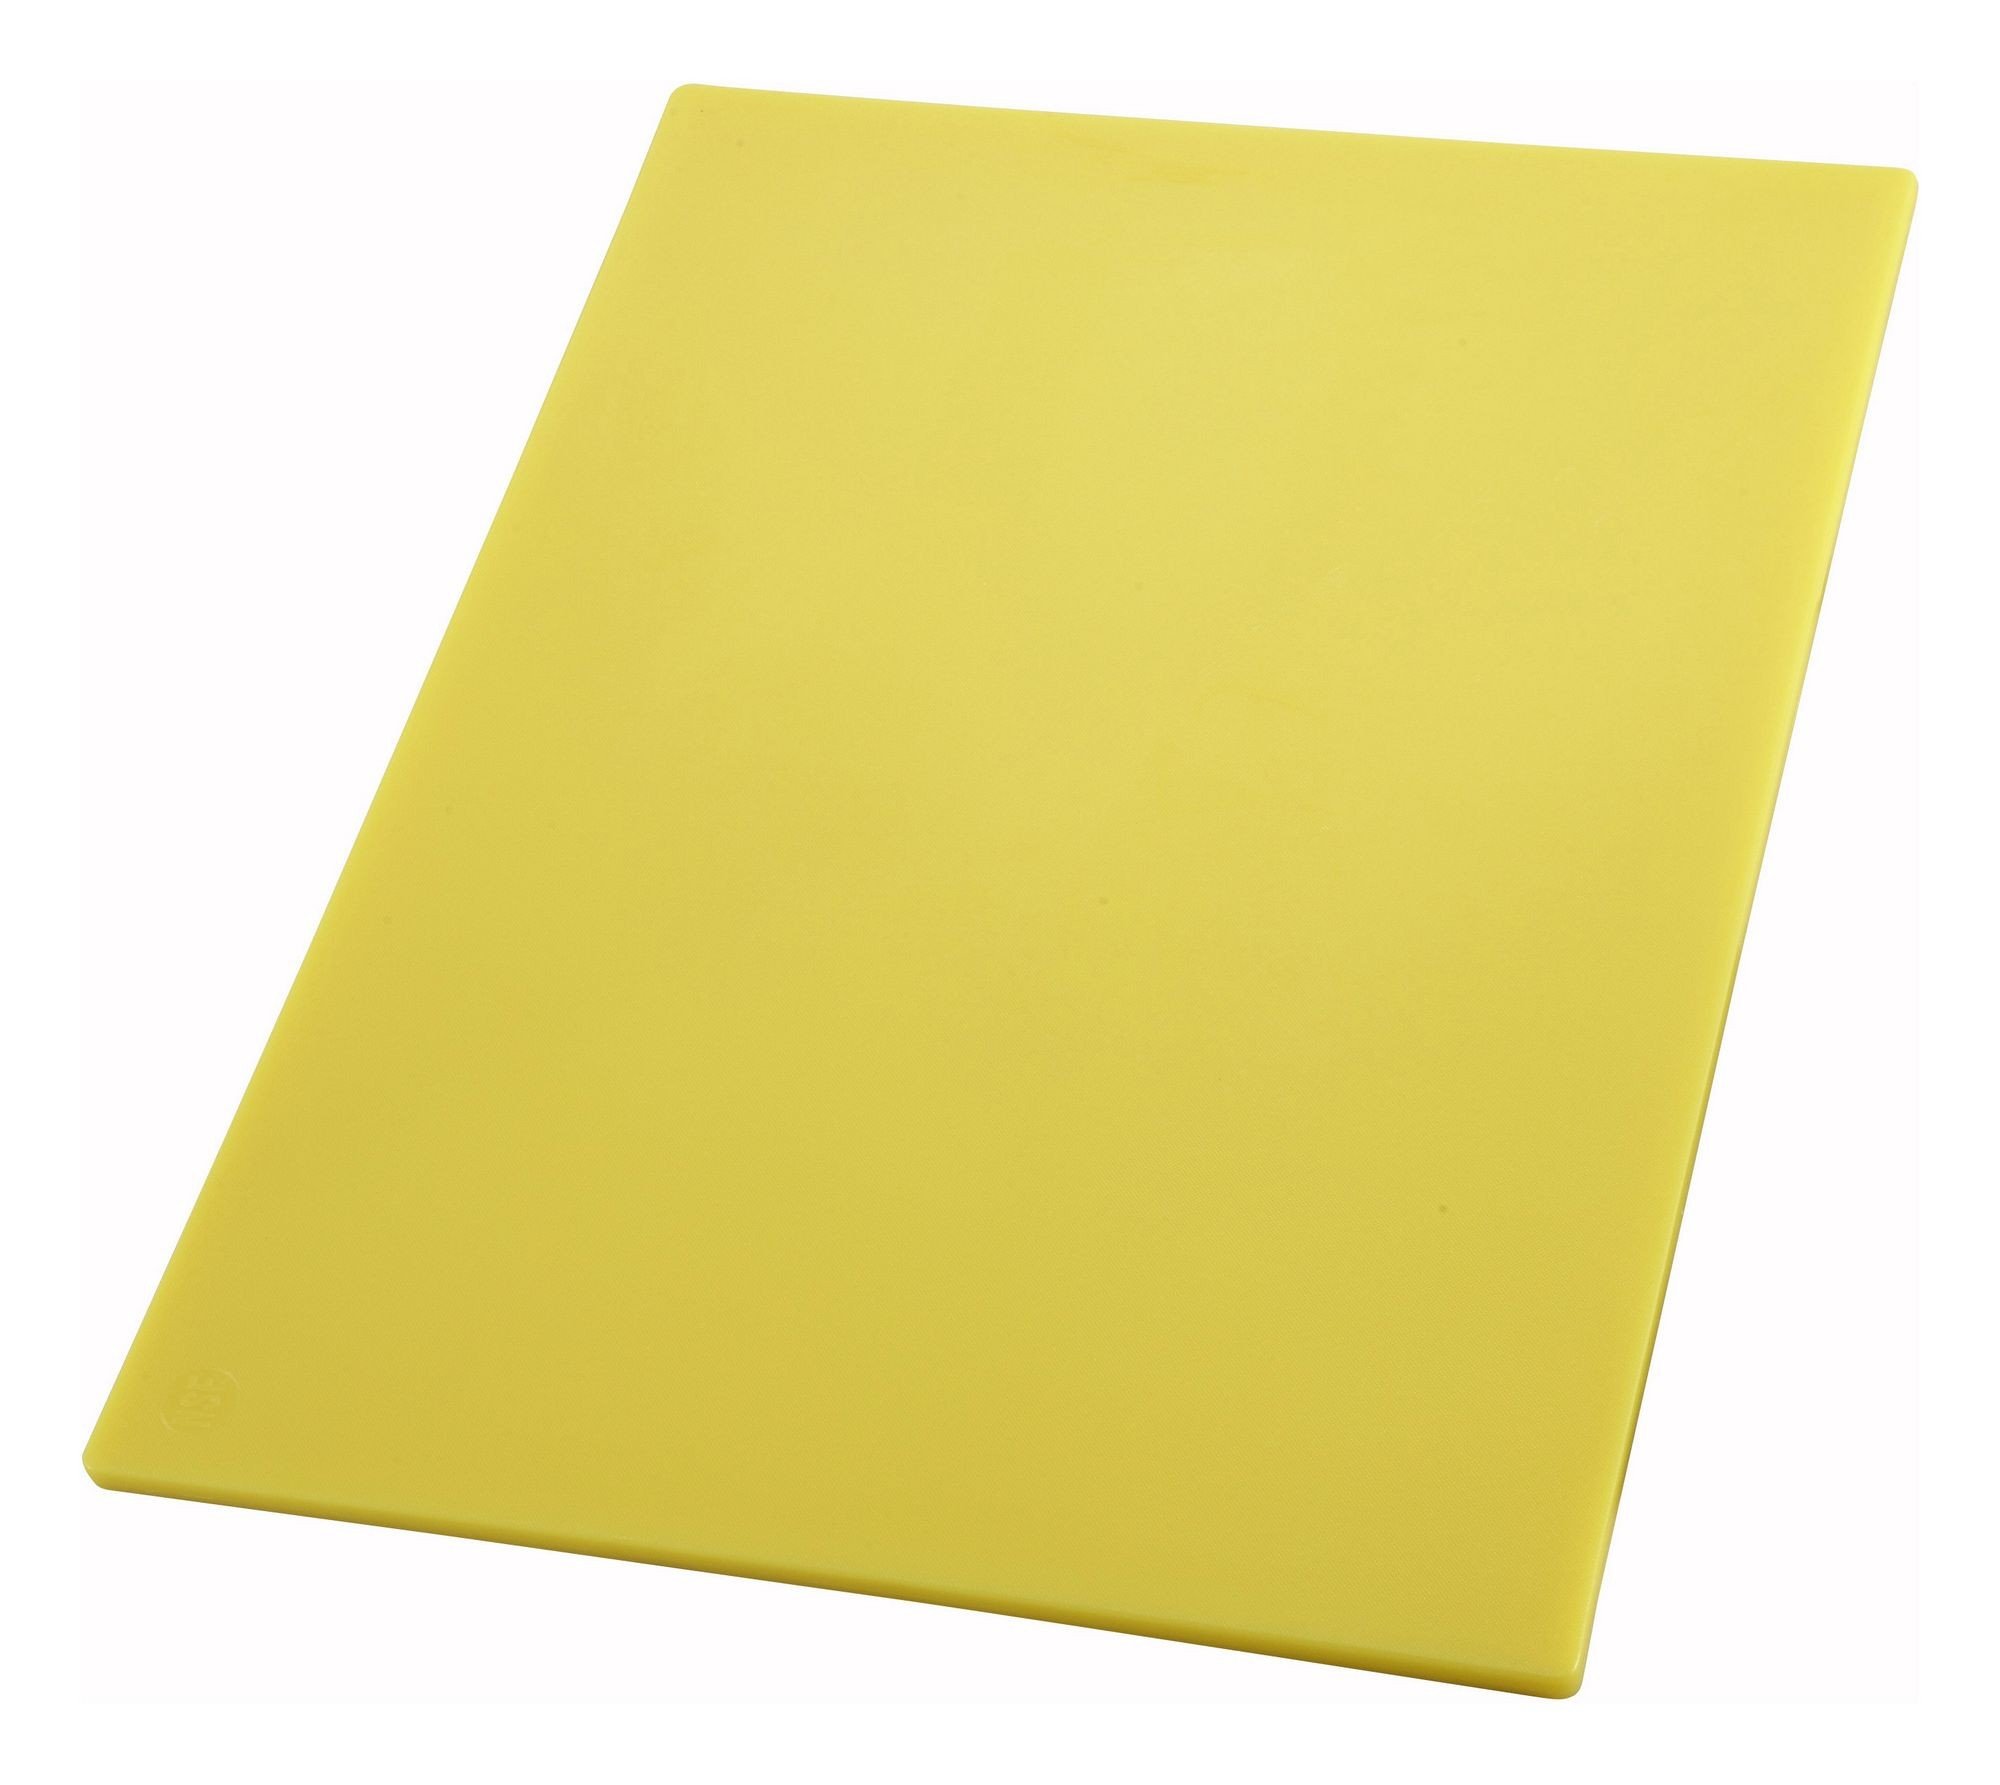 "Winco CBYL-1824 Yellow Cutting Board 18"" x 24"" x 1/2"""